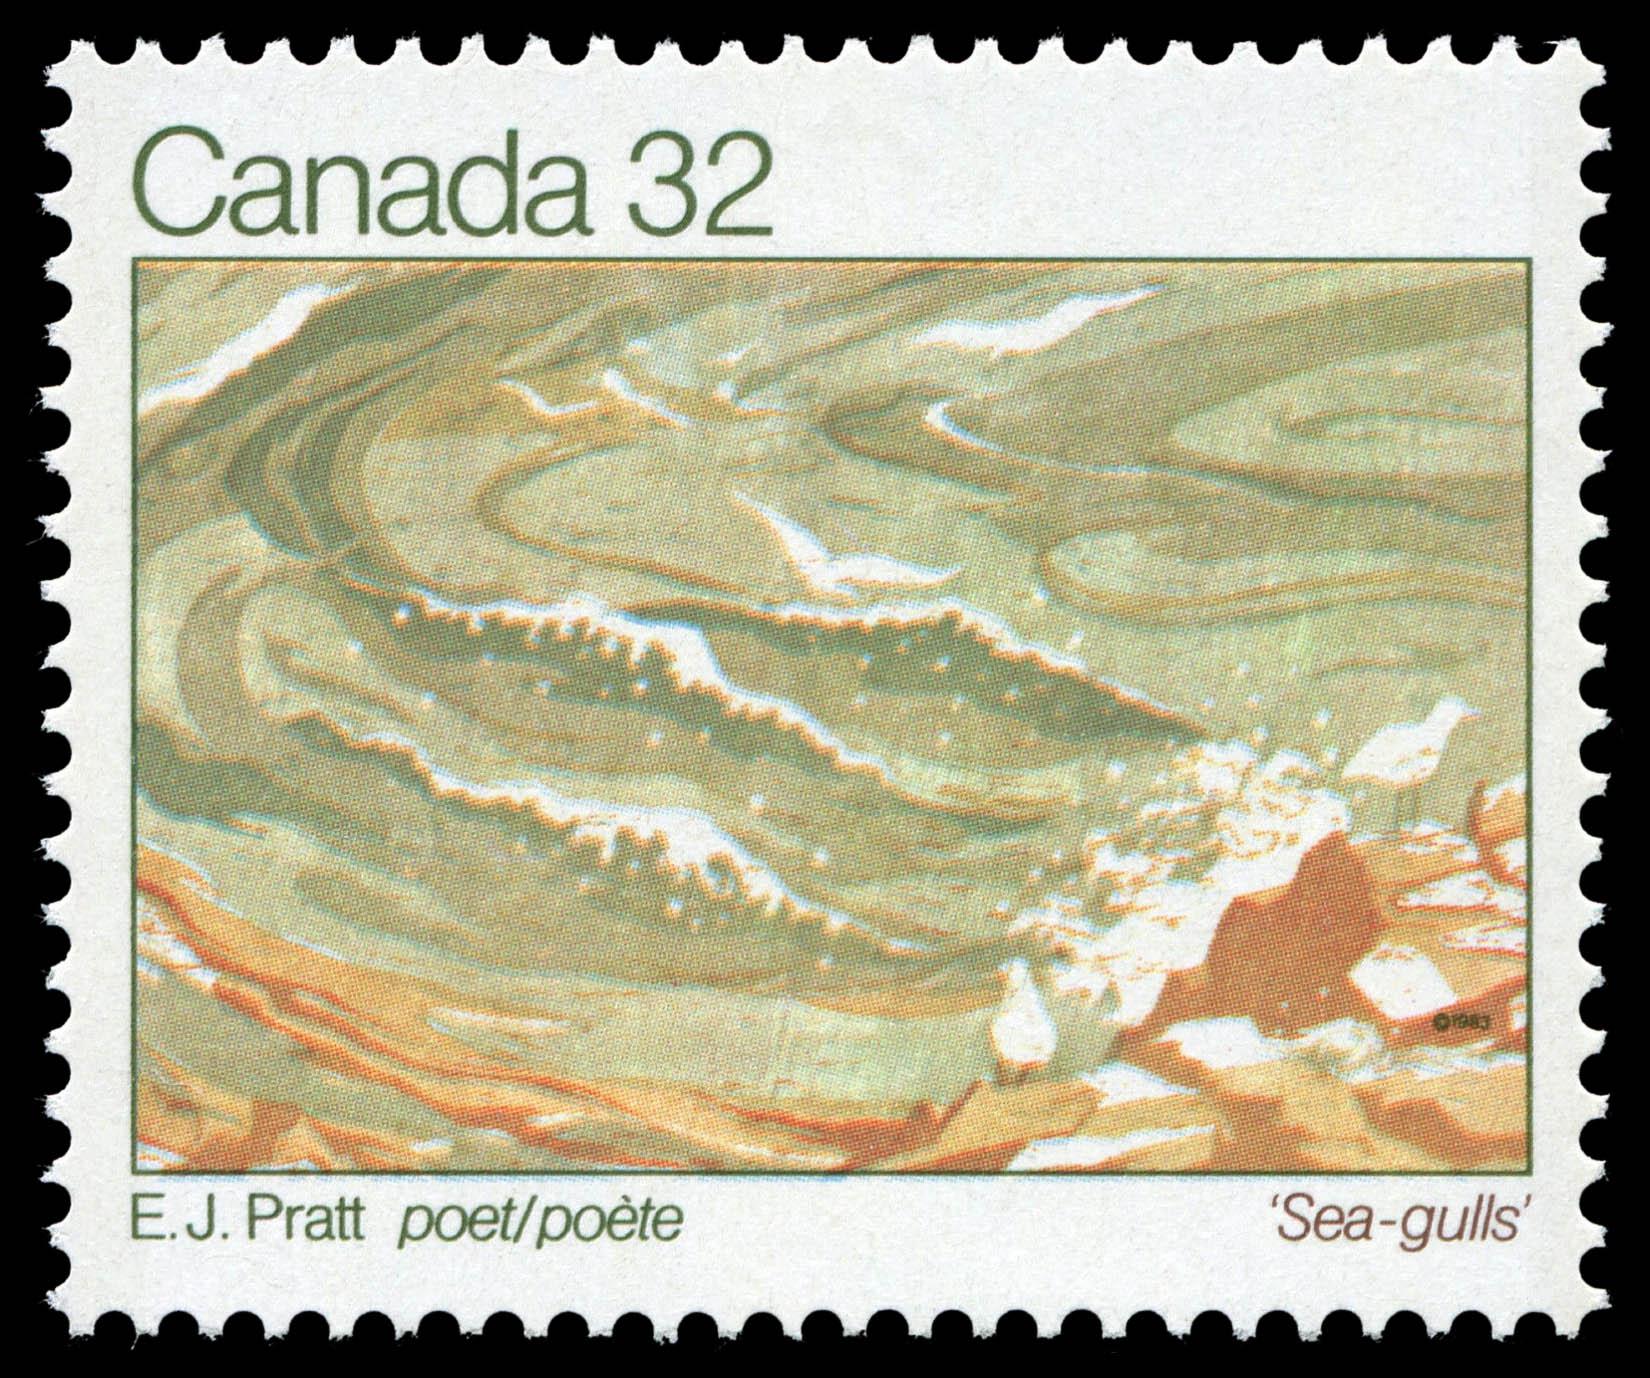 E.J. Pratt, Poet, Sea-gulls Canada Postage Stamp